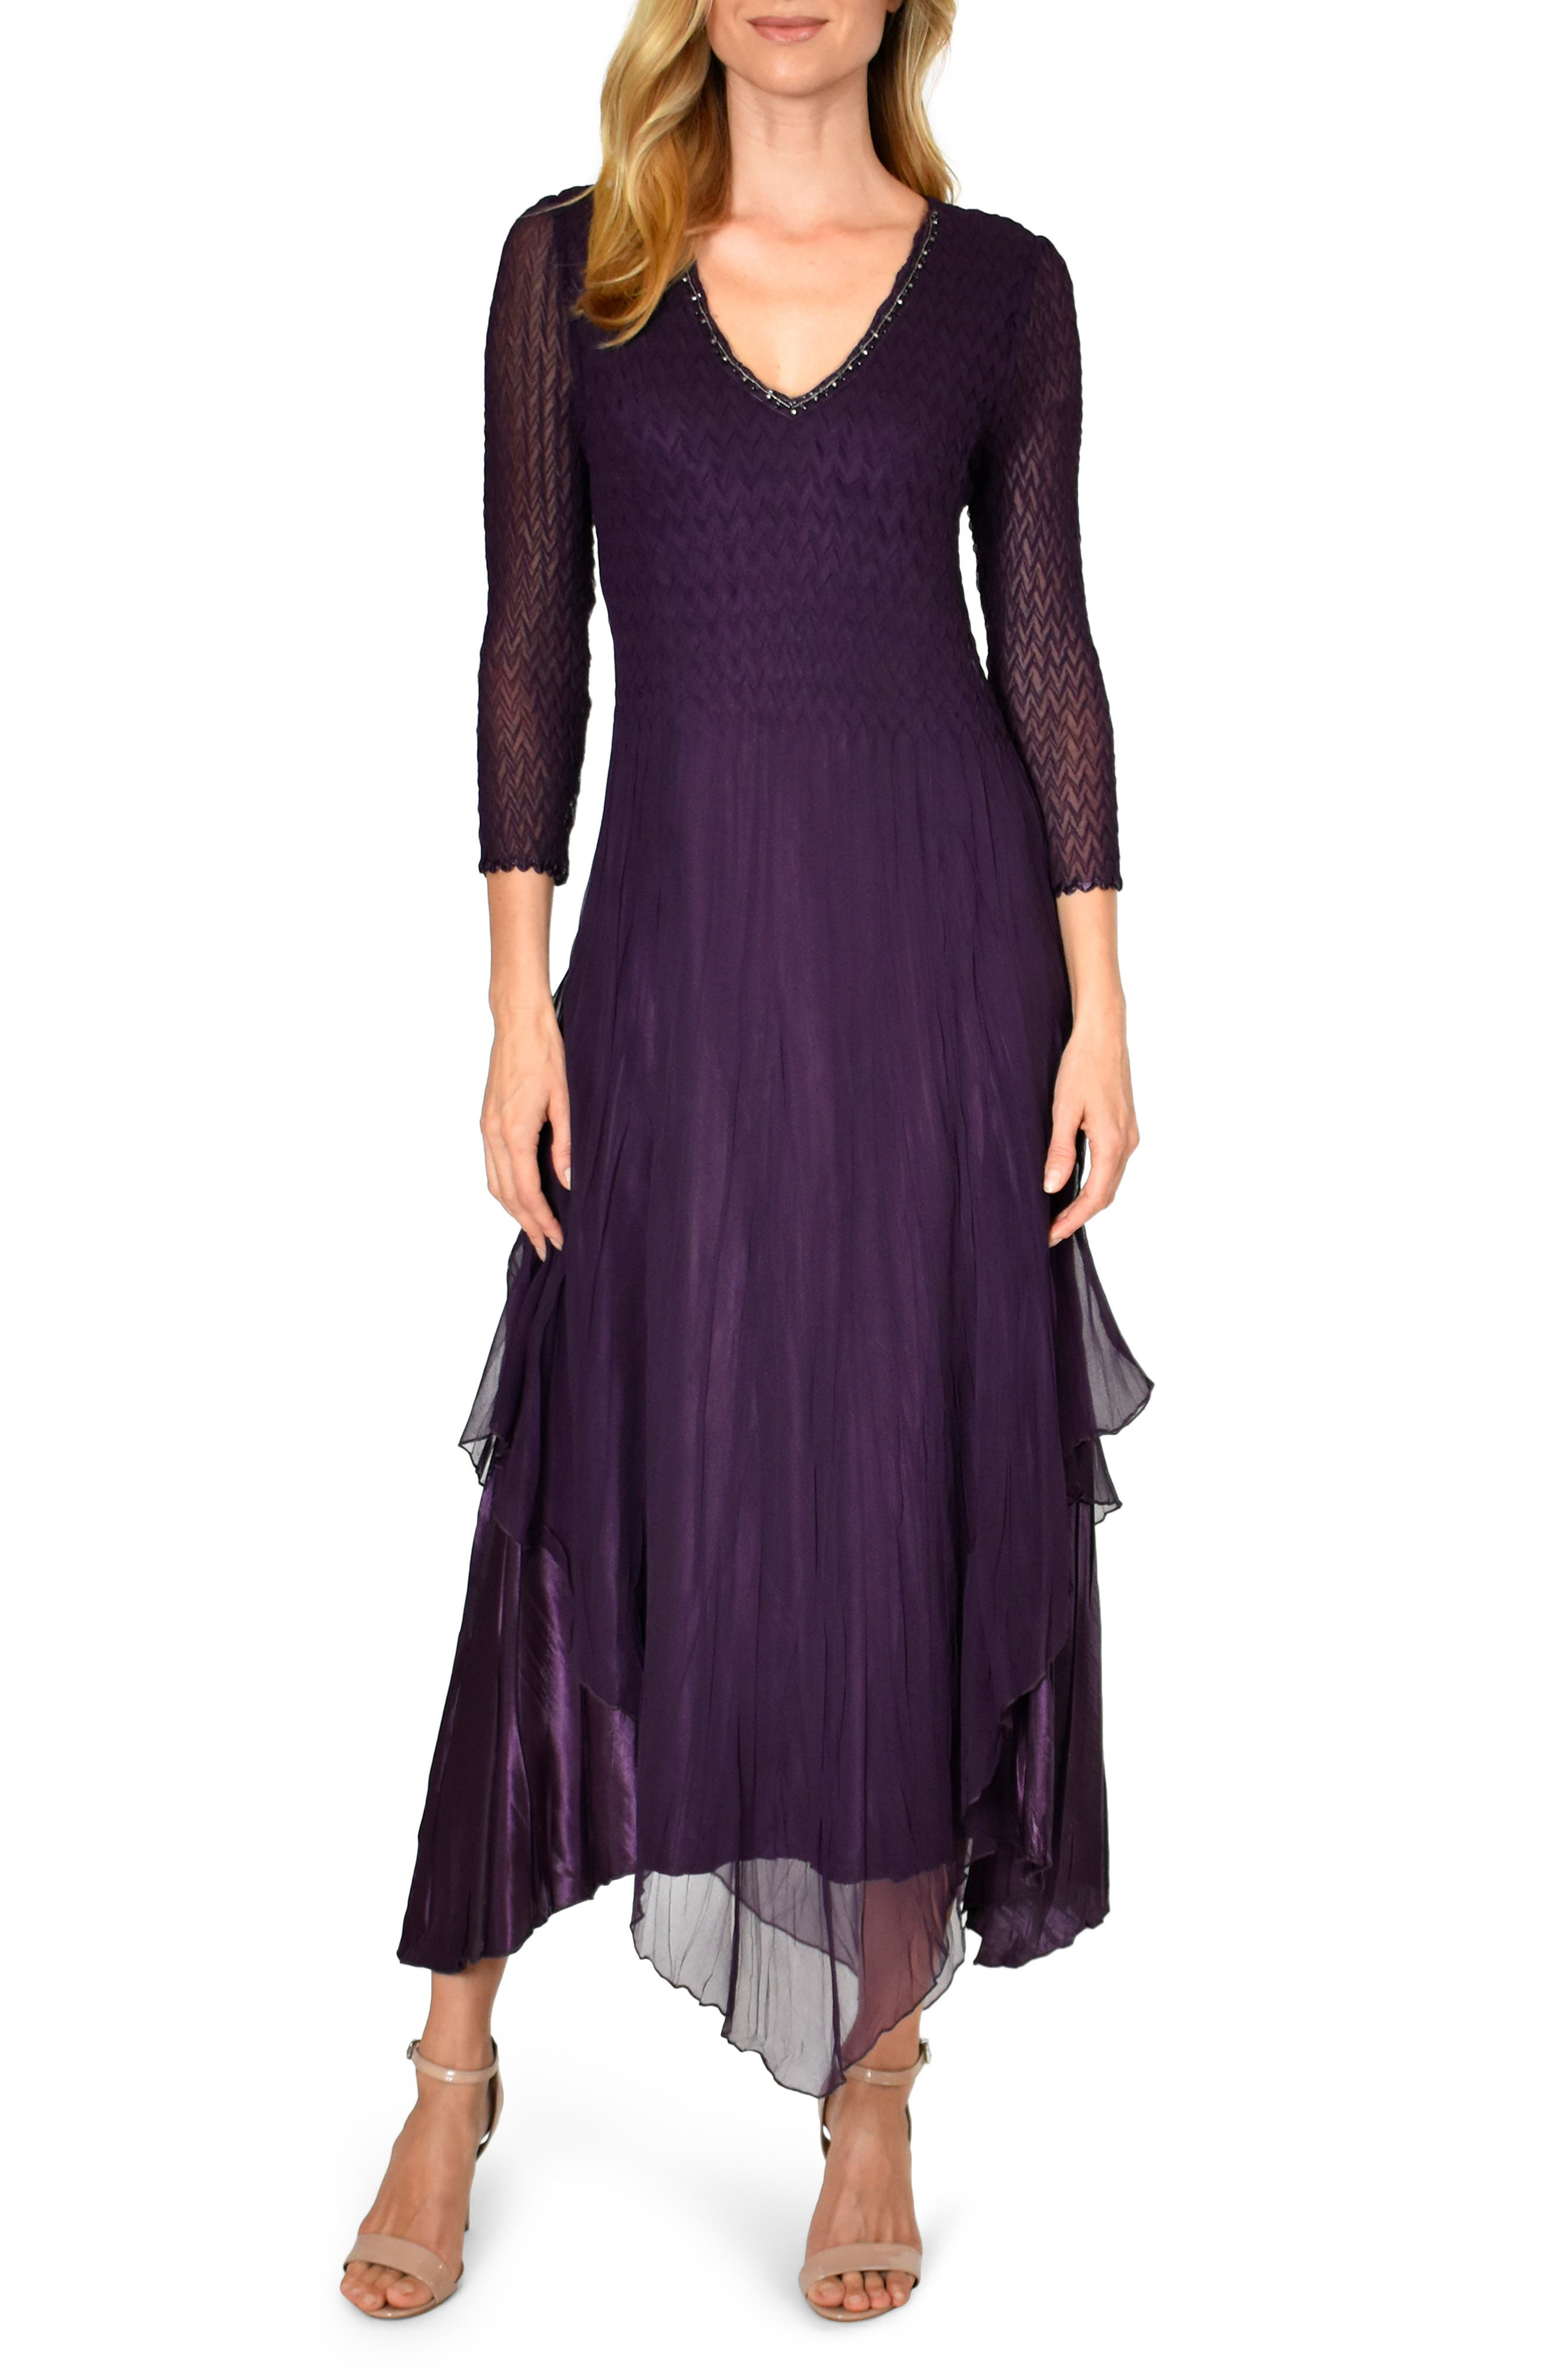 Roaring 20s Costumes- Flapper Costumes, Gangster Costumes Womens Komarov Flutter Hem Midi Dress $237.60 AT vintagedancer.com